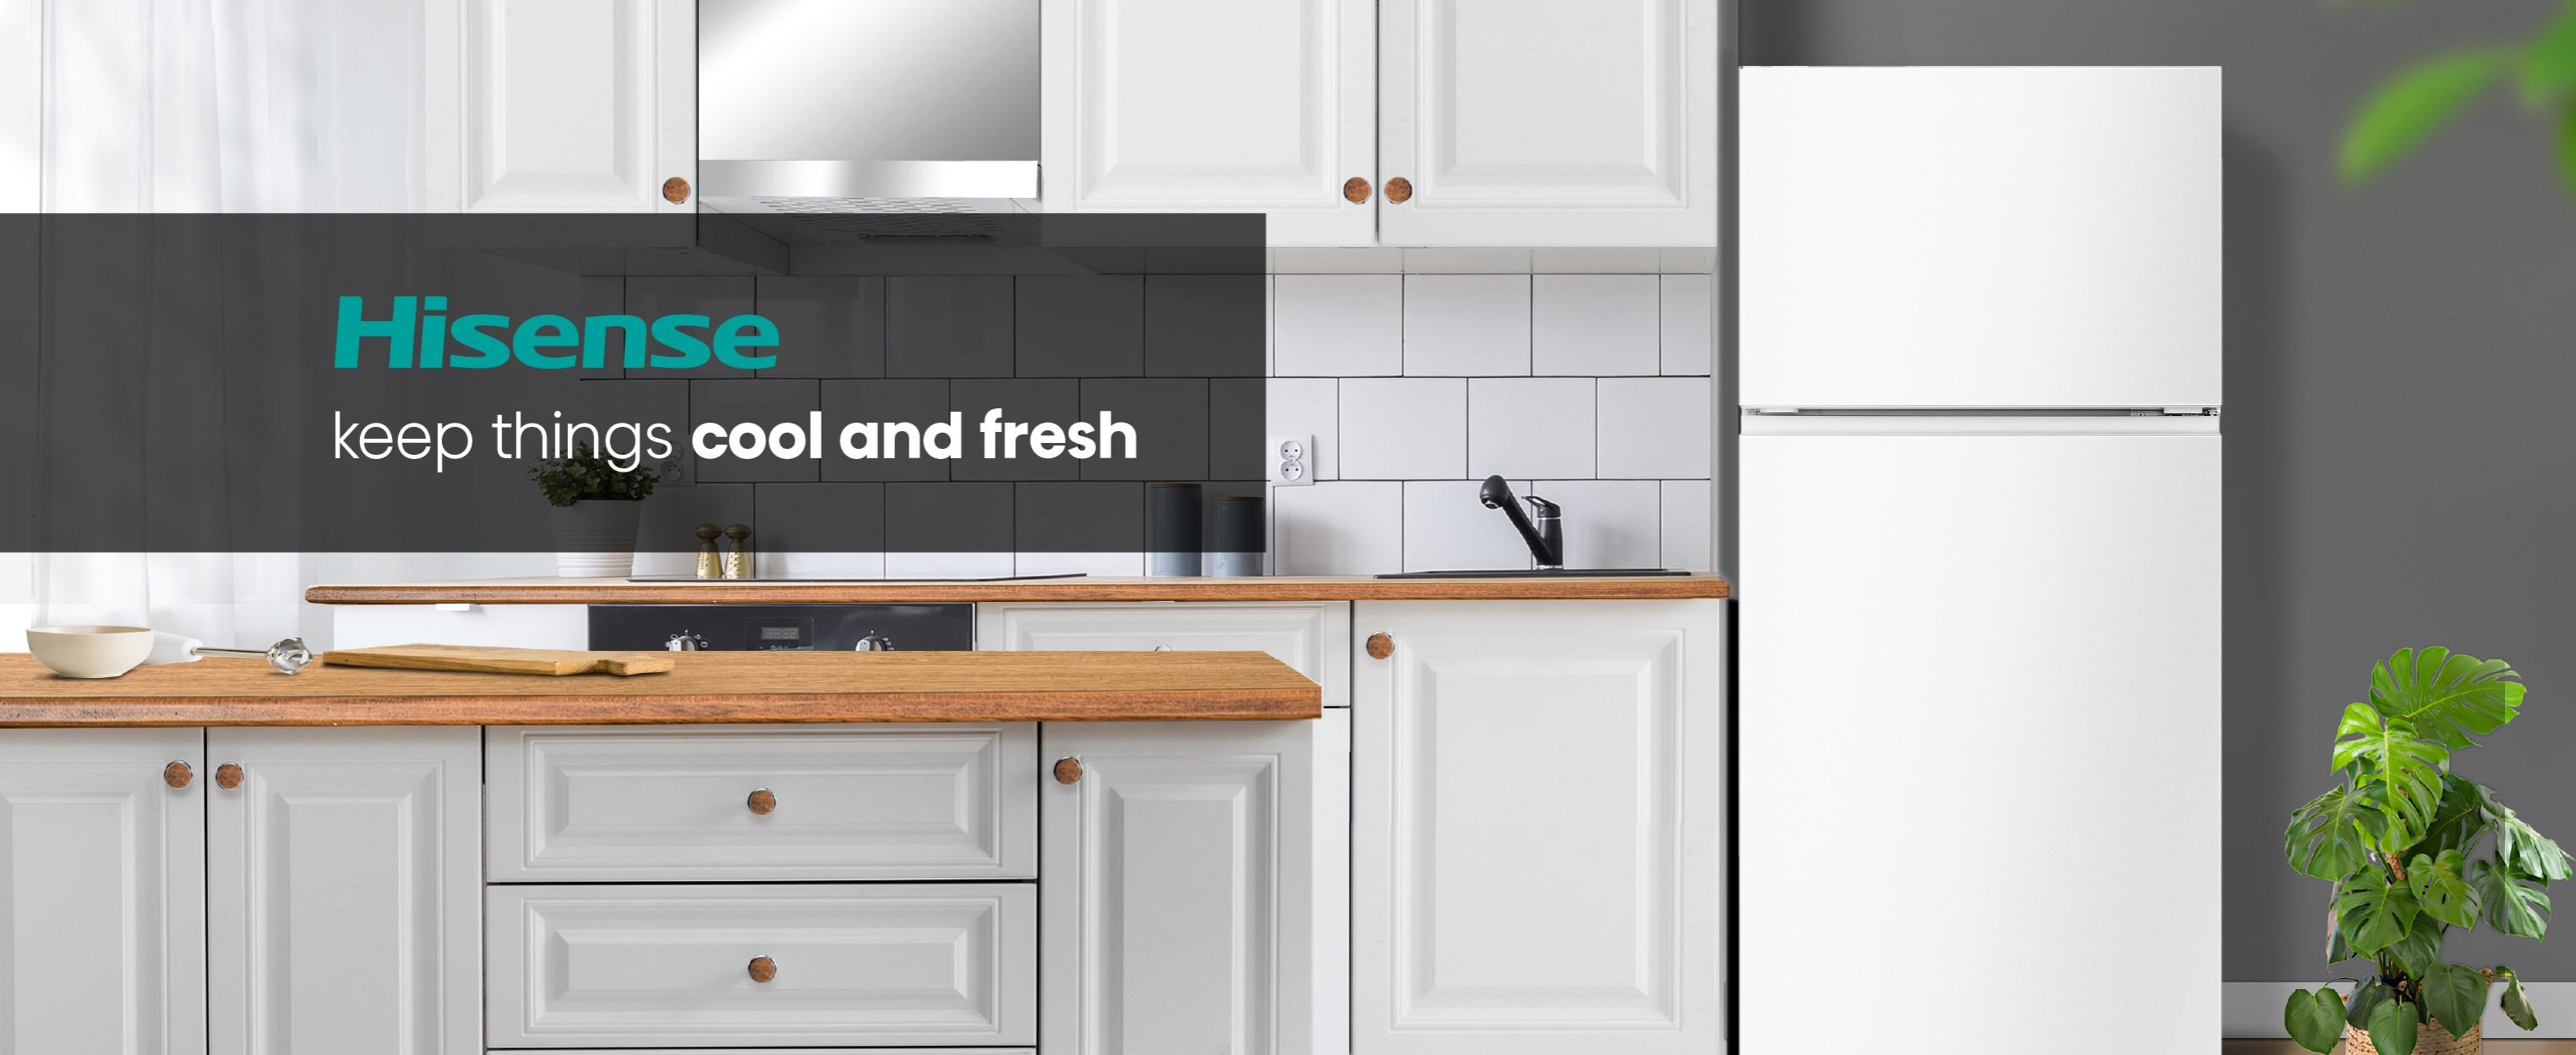 Hisense keep things cool and fresh